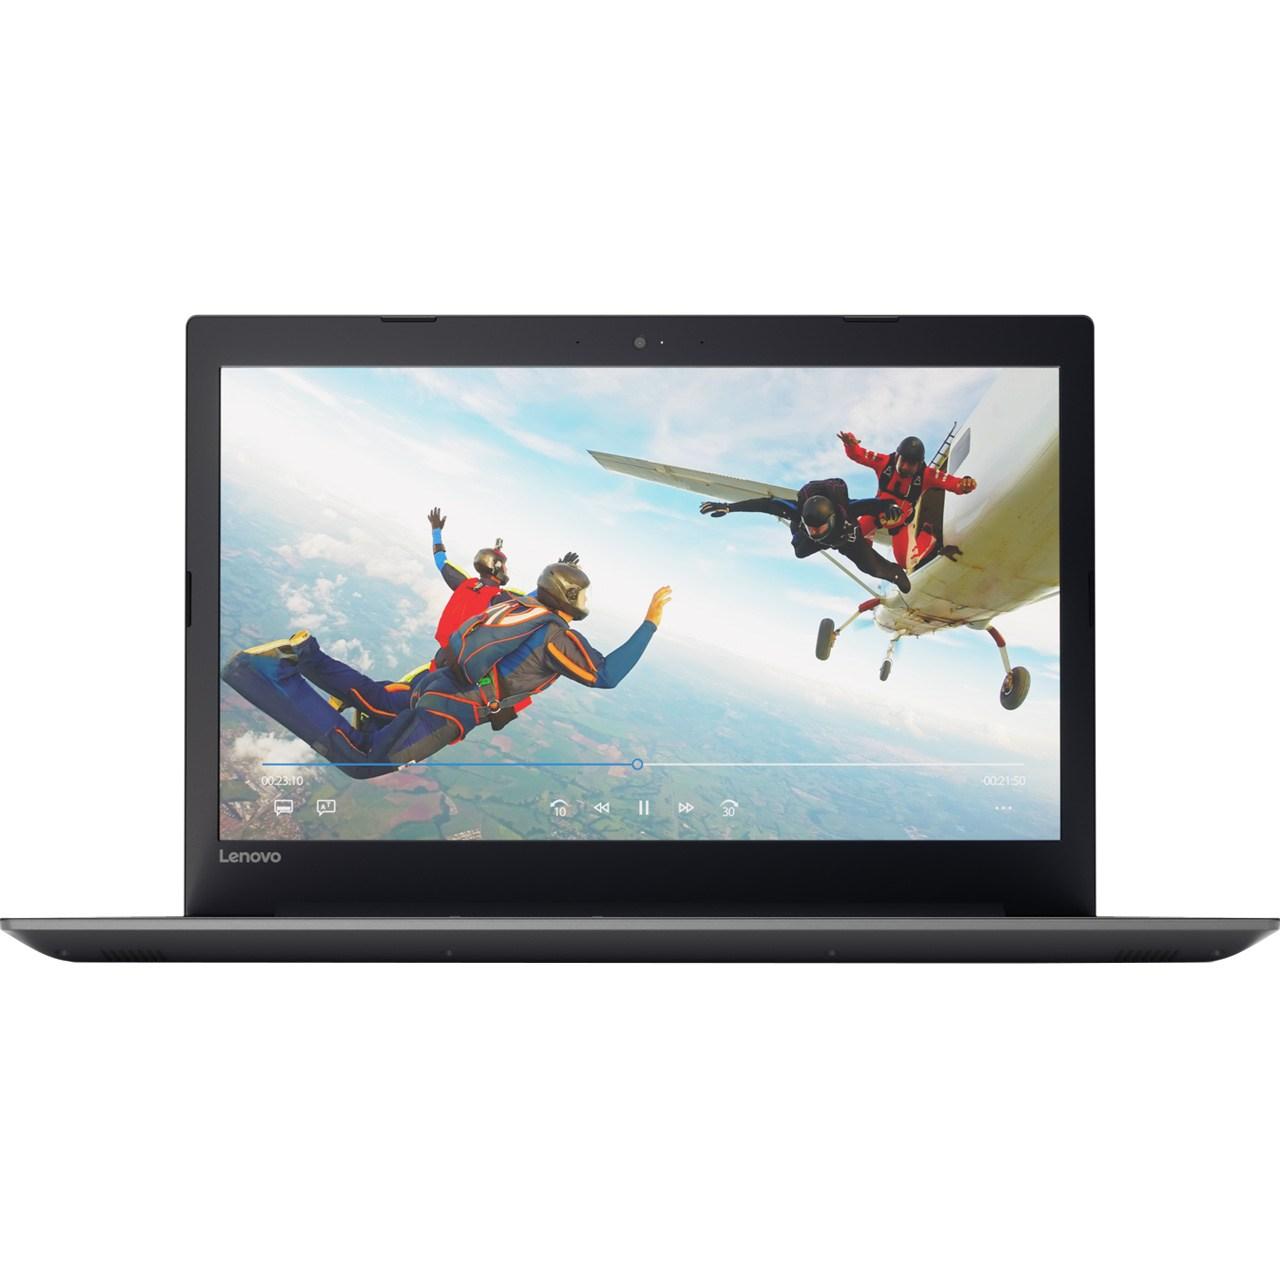 لپ تاپ 15 اینچی لنوو مدل Ideapad 320 - S